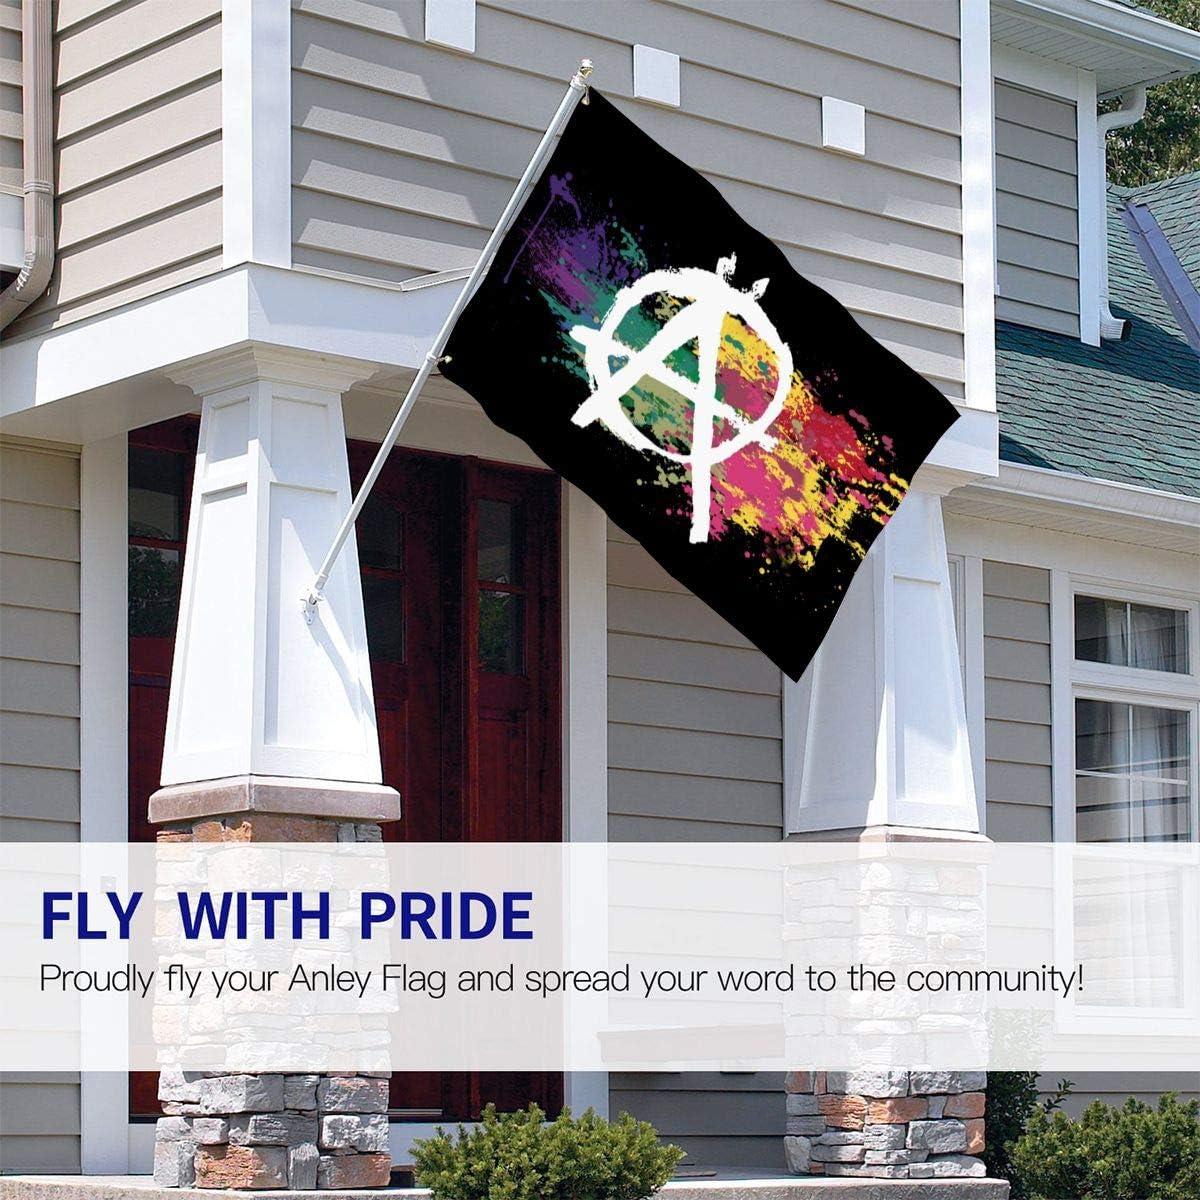 Garden Yard Decorations 4x6 Ft Outdoor Artificial Flag for Home Lkbihl Anarchy Symbol Watercolor Rainbow Decorative Garden Flags